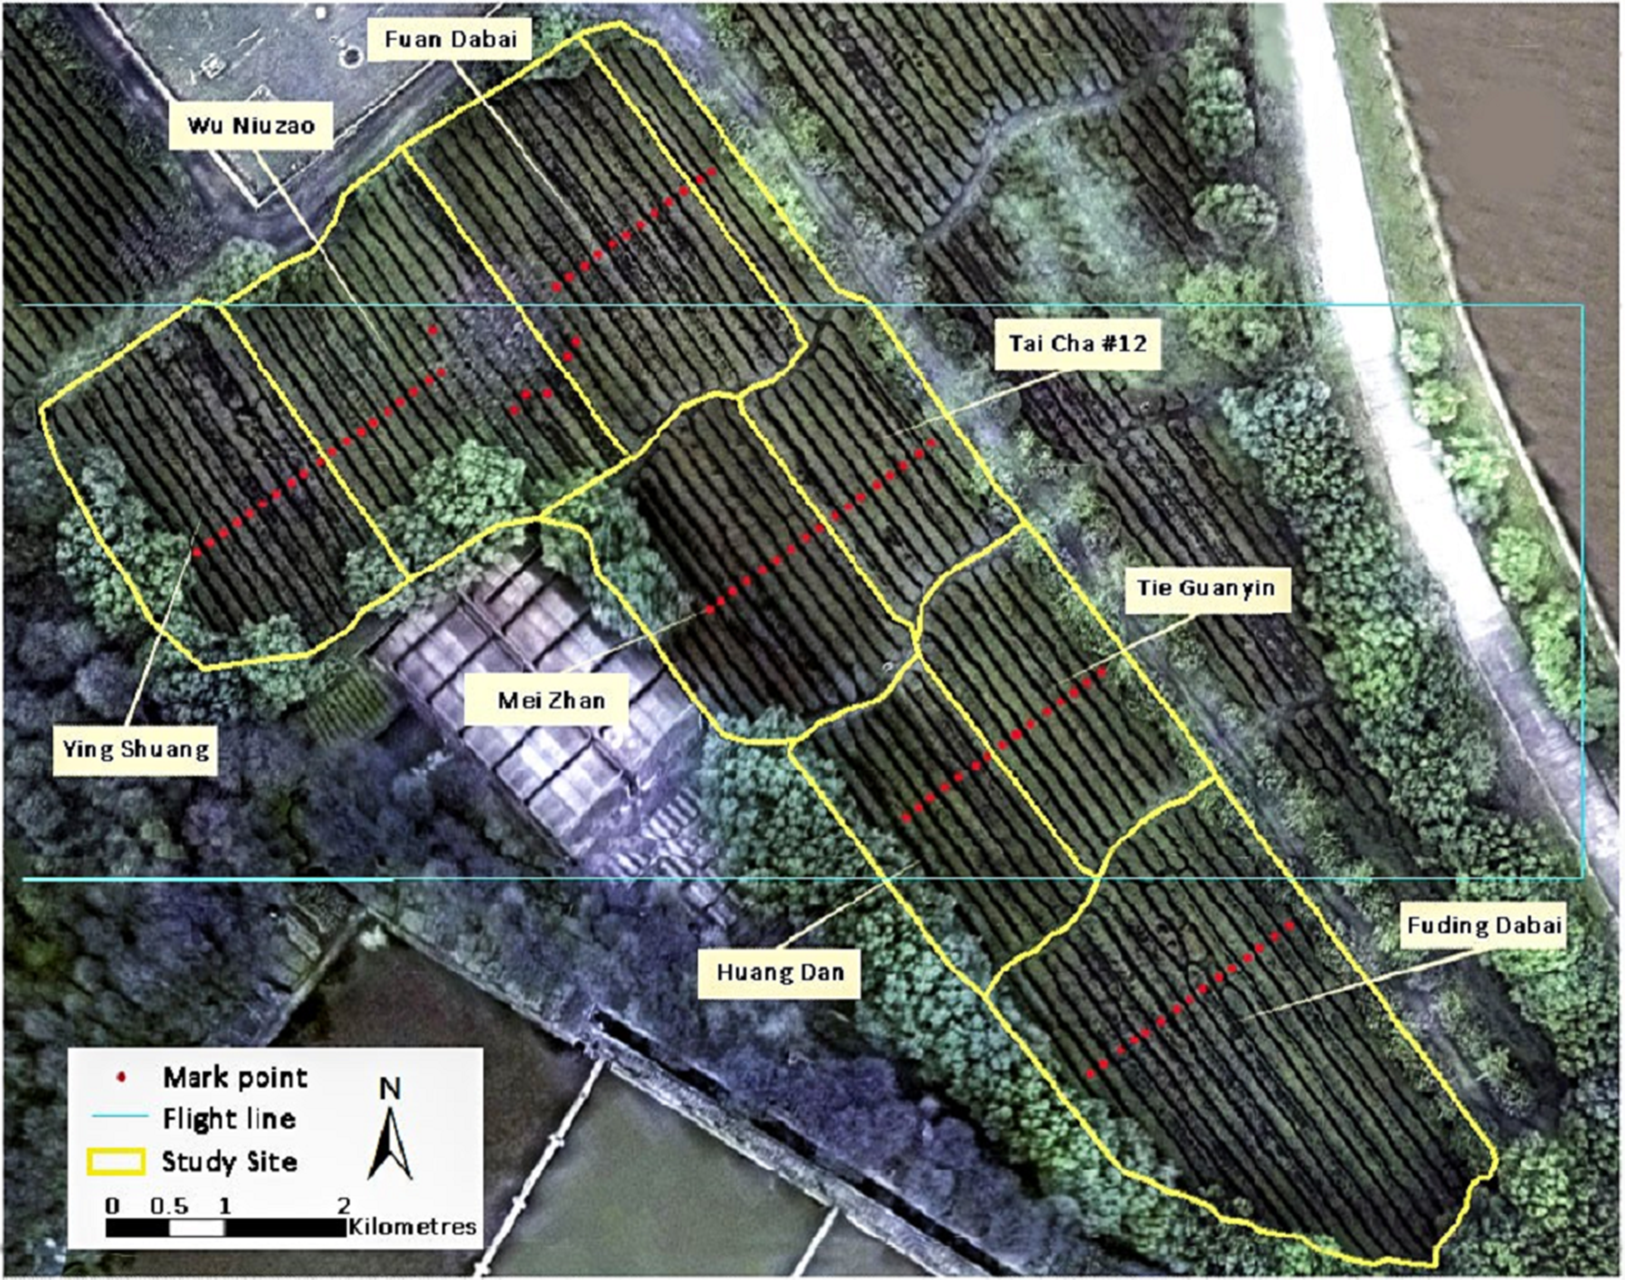 Tea Cultivar Classification And Biochemical Parameter Estimation Niu Huang Wan Download Full Size Image